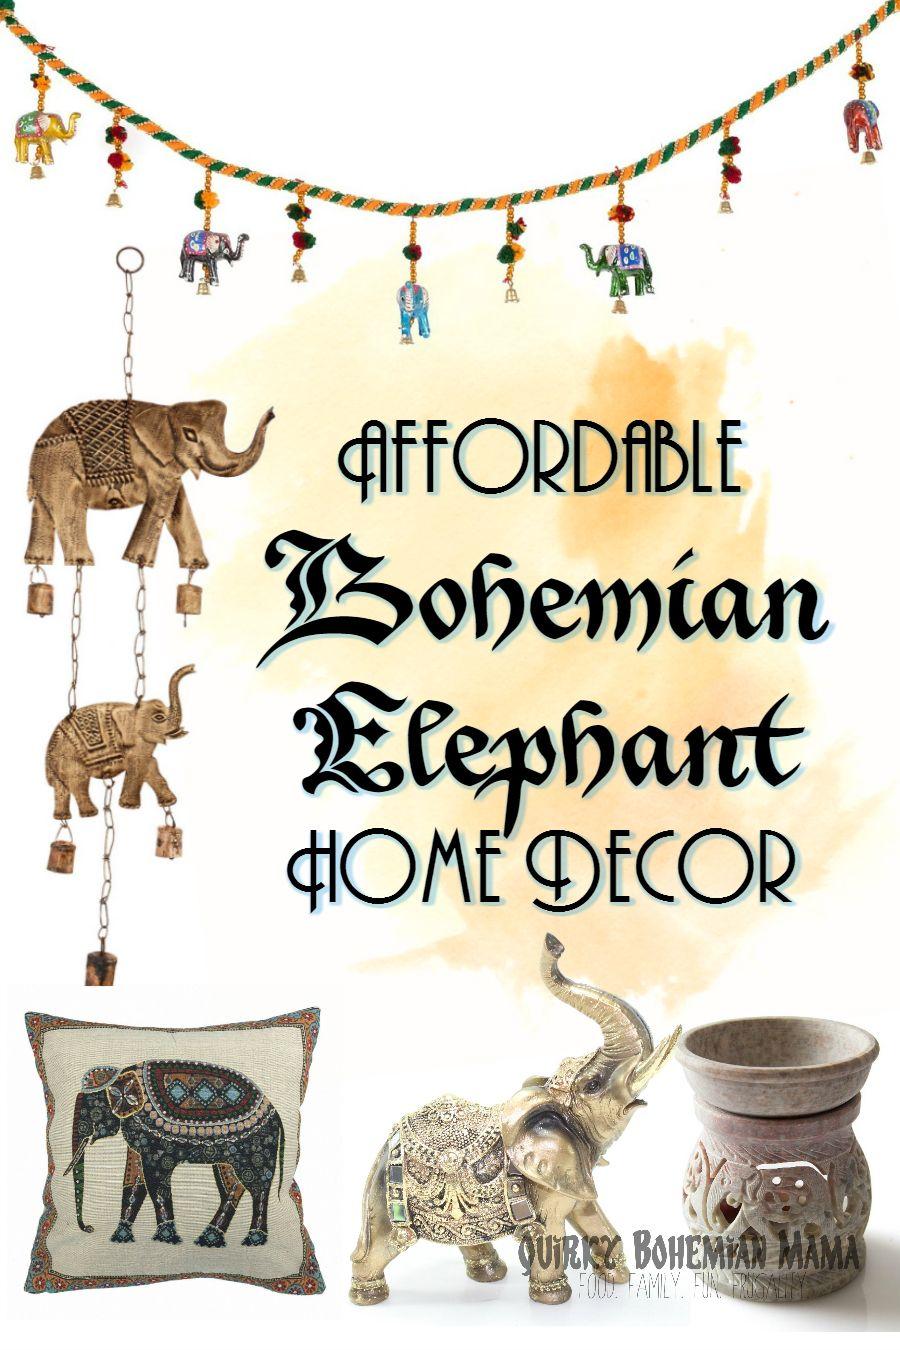 Quirky Bohemian Mama: Affordable Bohemian Elephant Home Decor {Boho  Bohemian Hippie Home Decor Under$20}